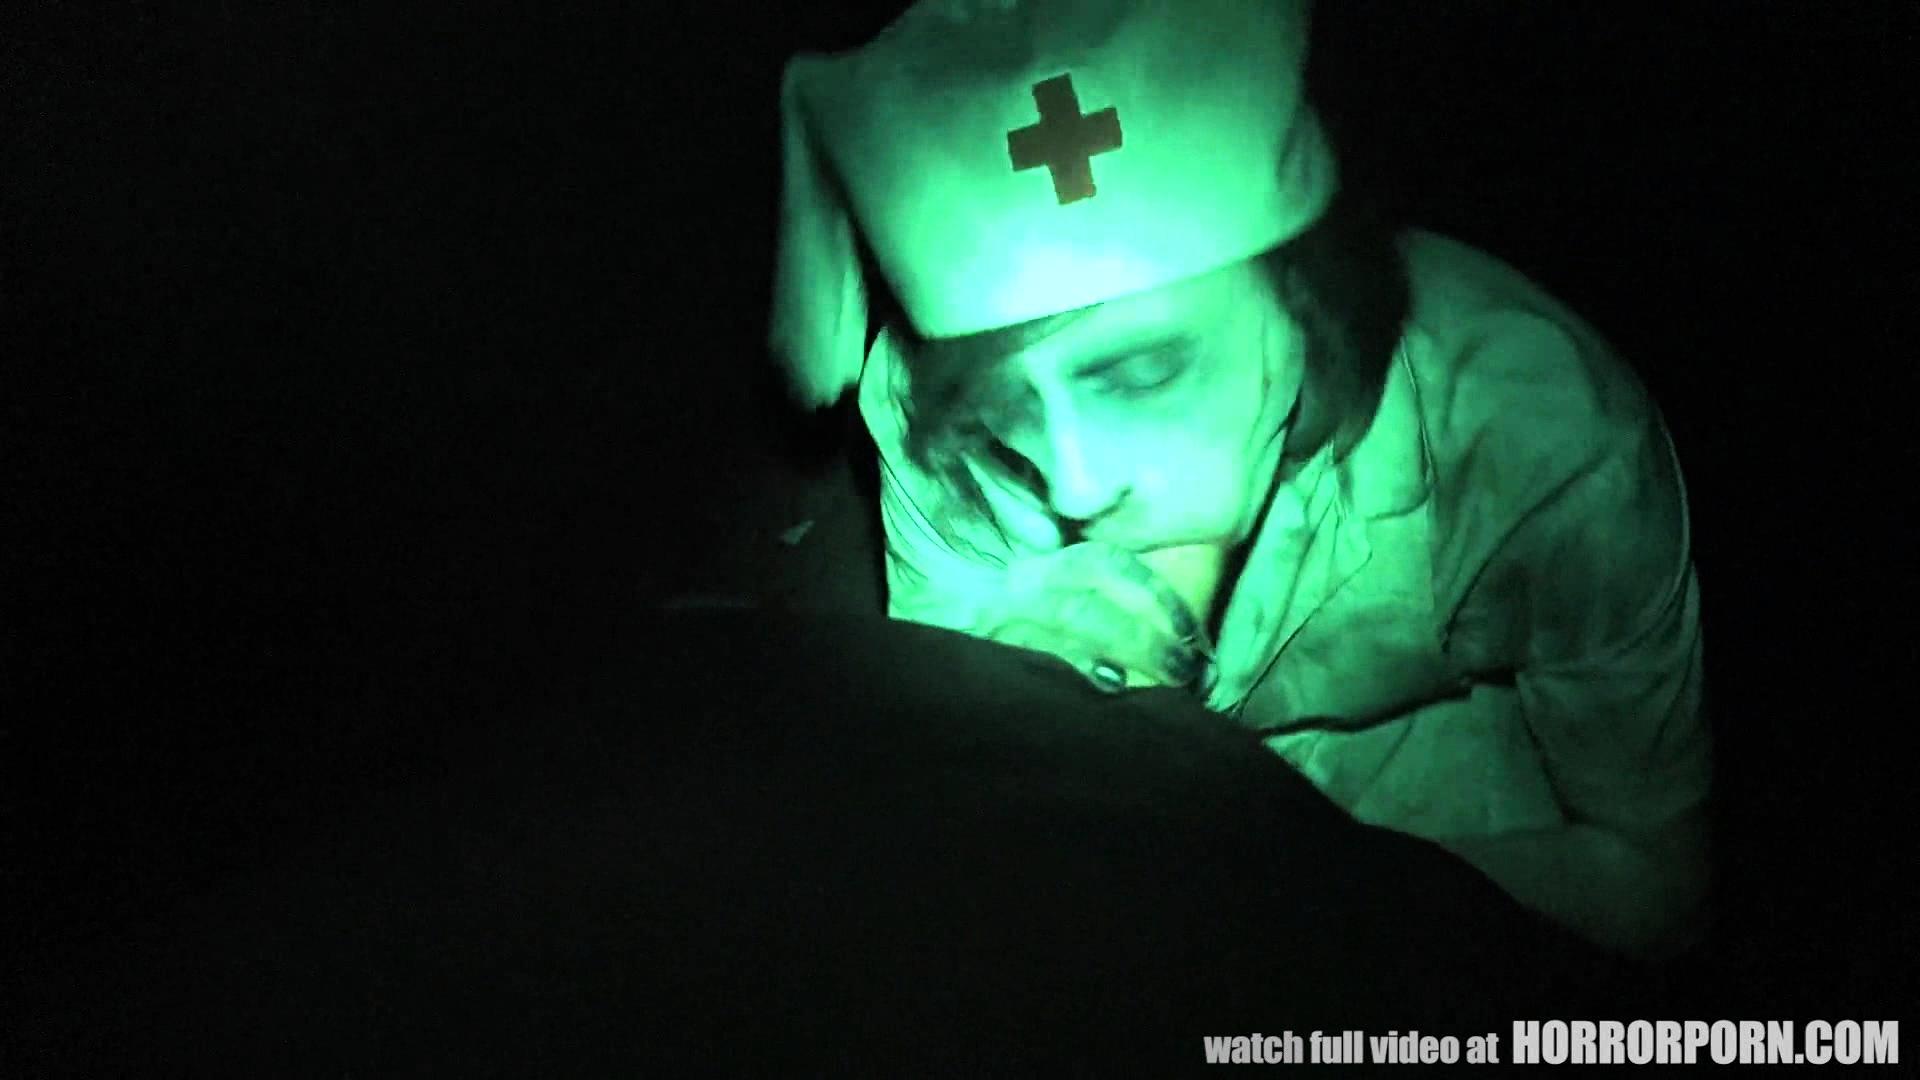 Horrorporn hospital ghosts